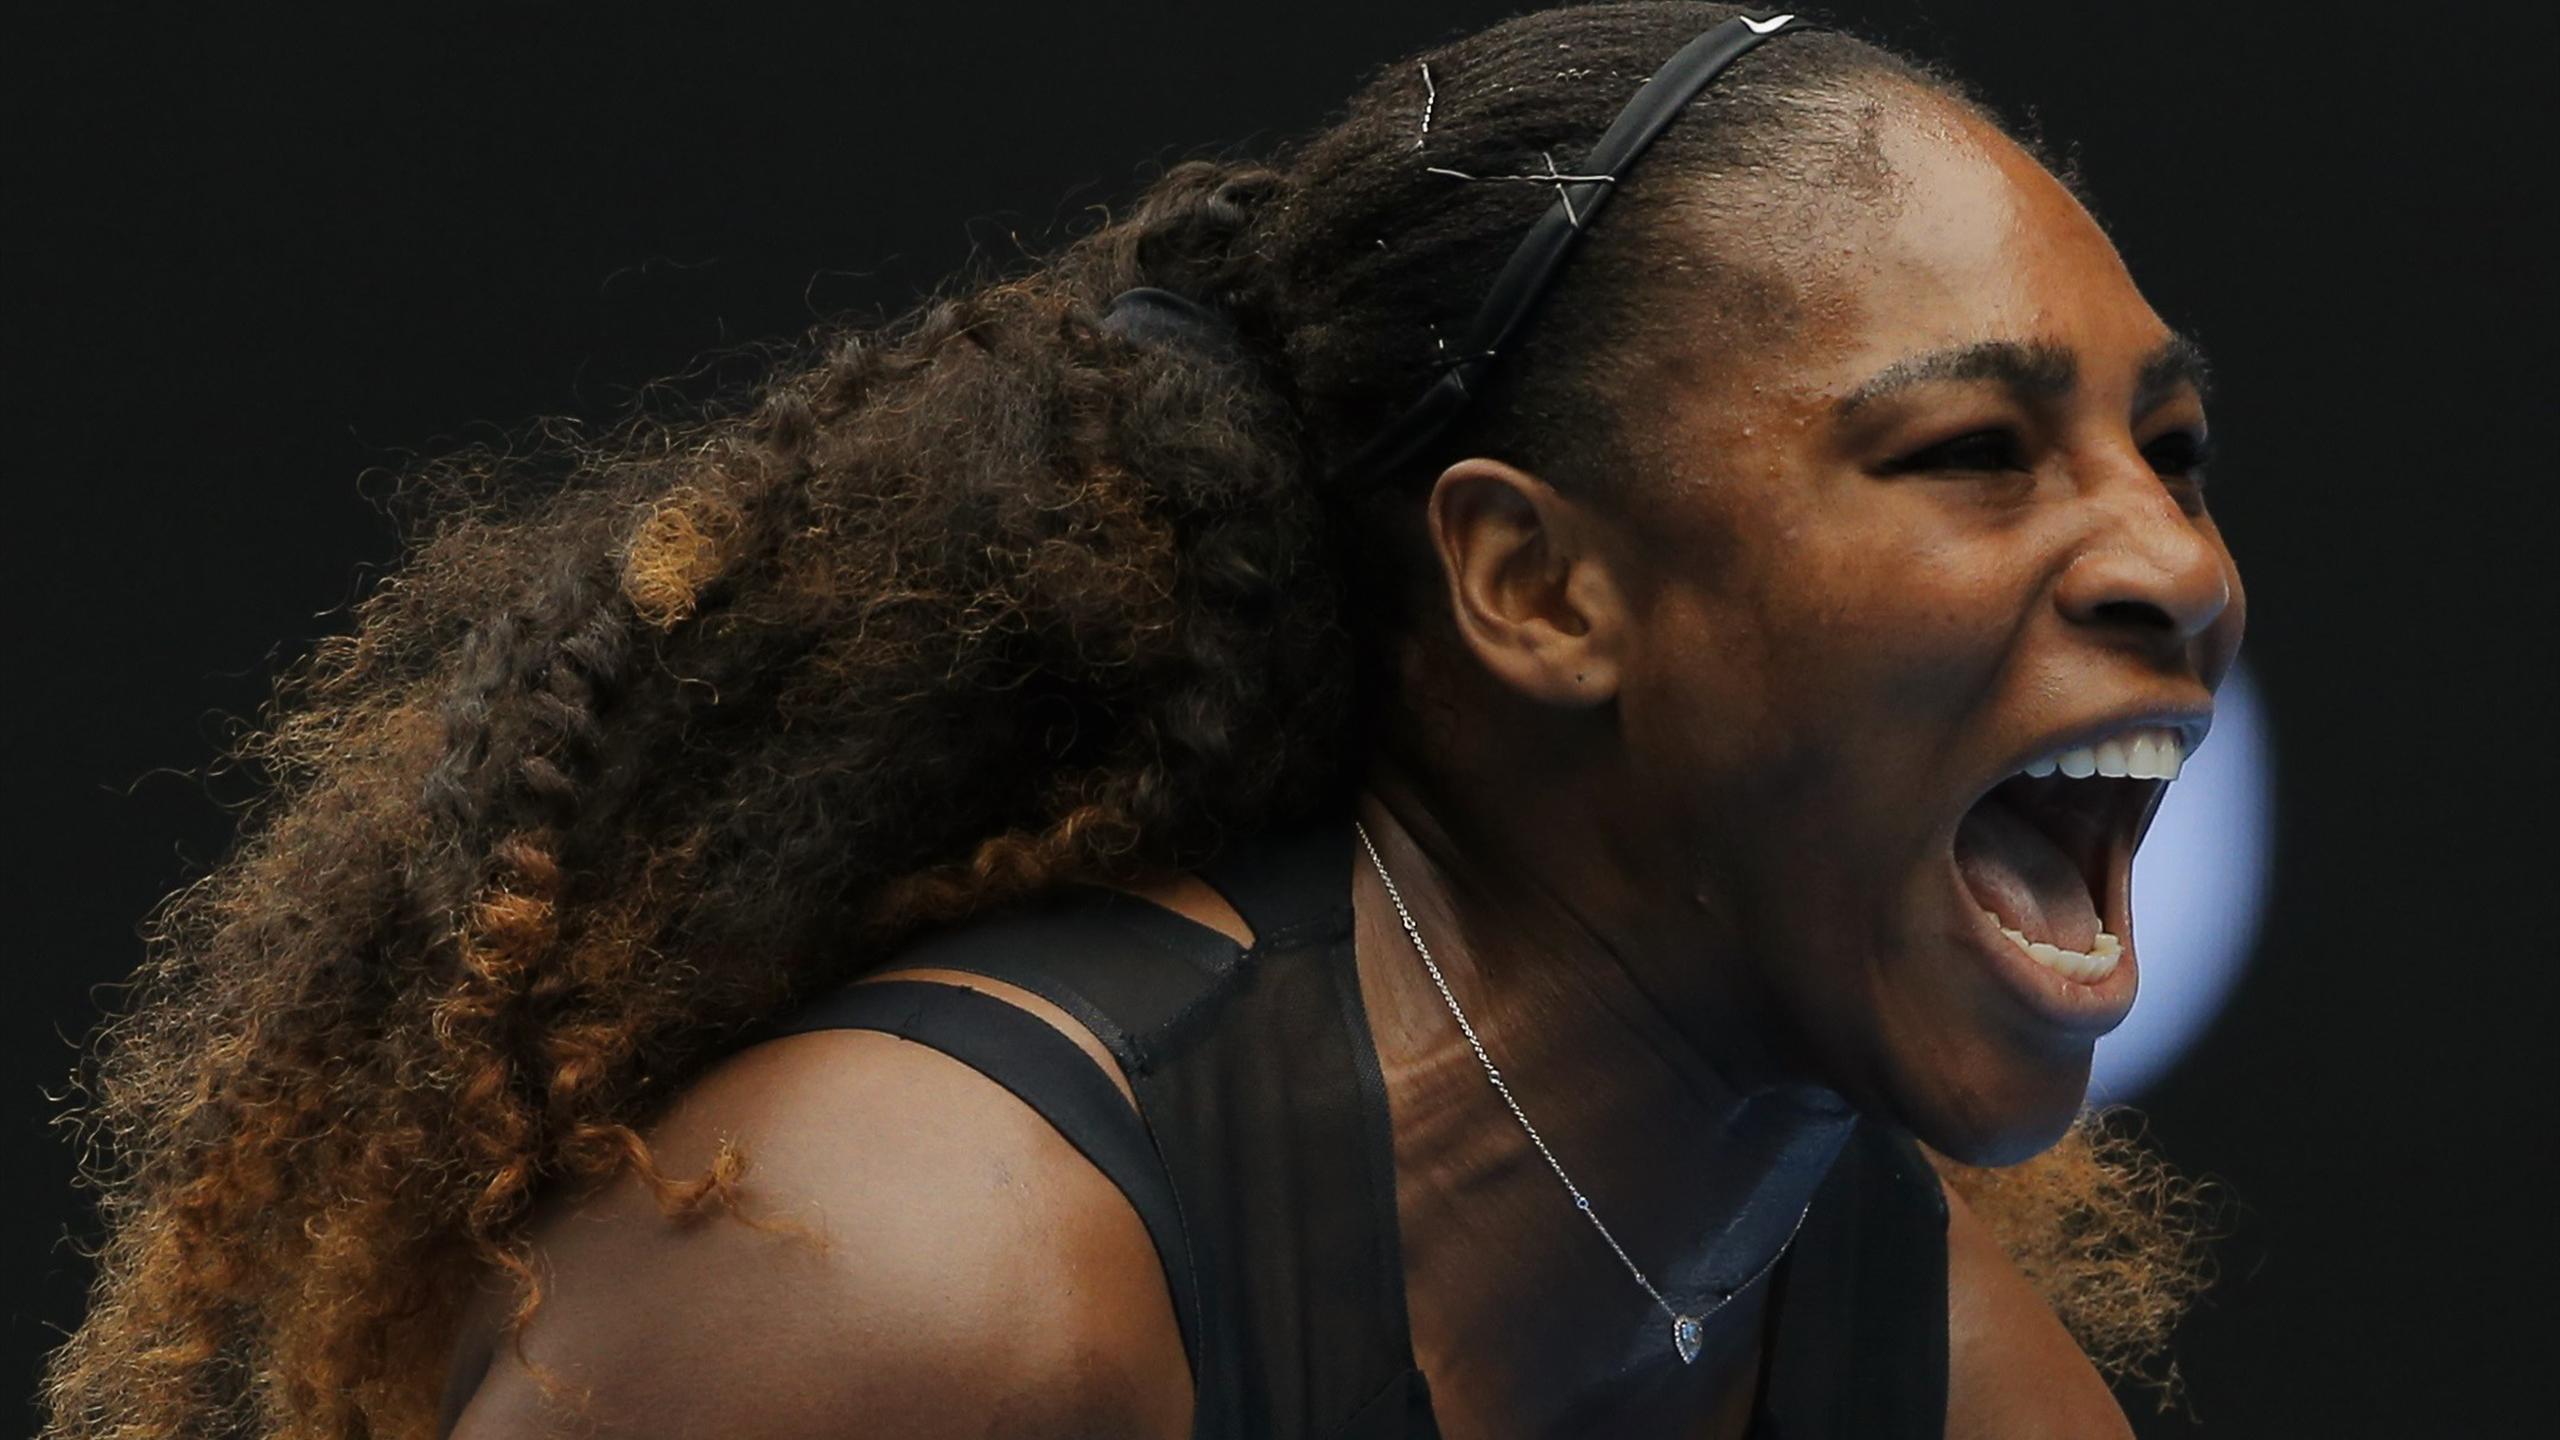 Serena Williams celebrates her first round win against Switzerland's Belinda Bencic